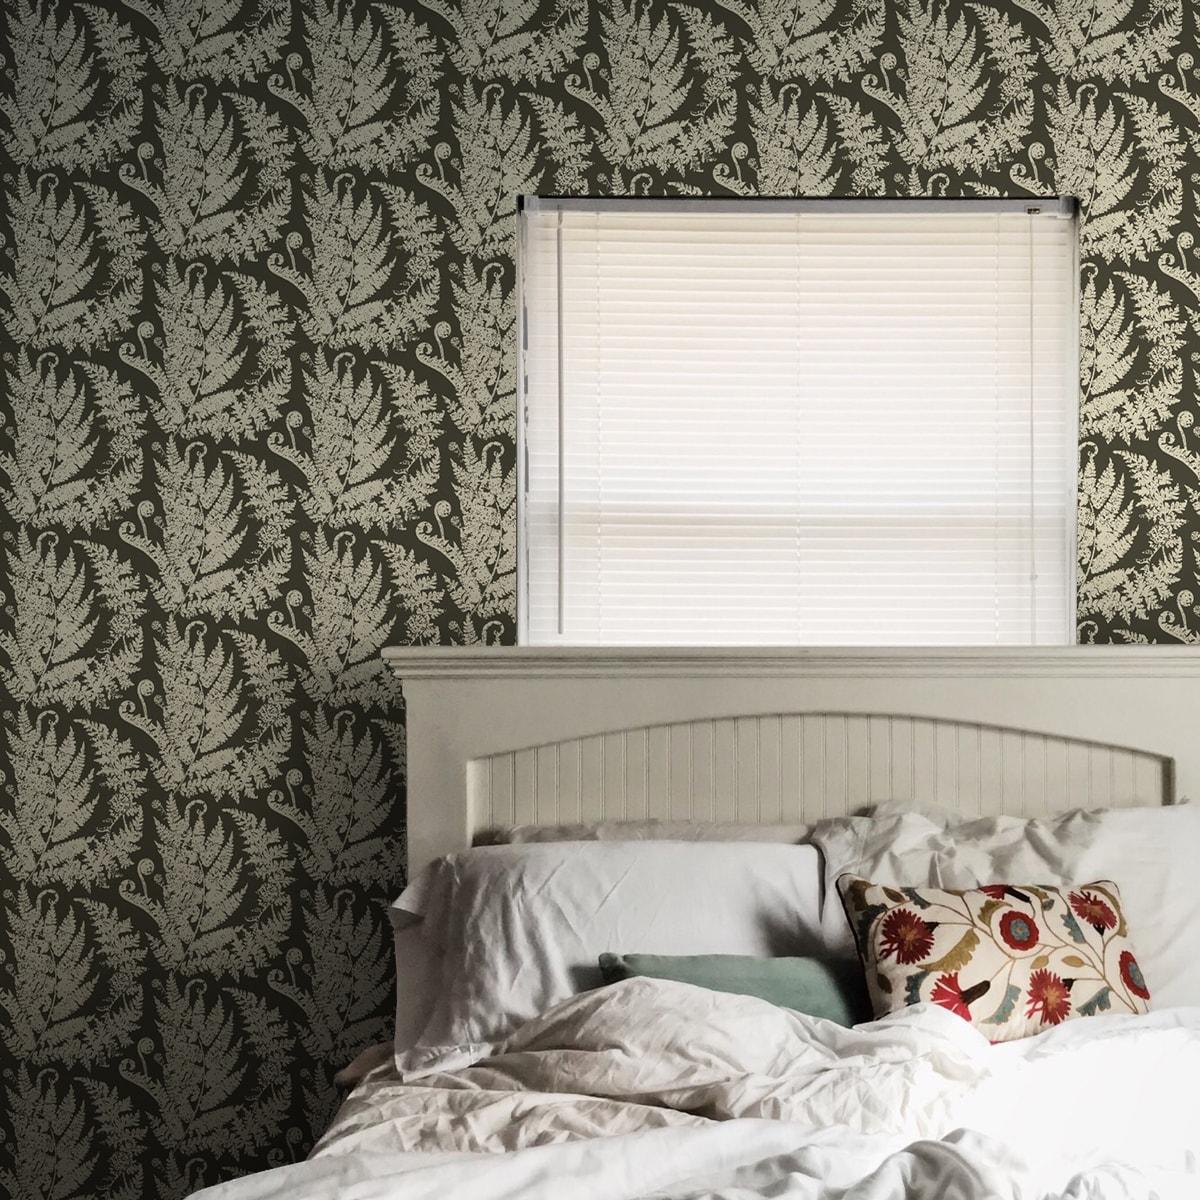 "Wandtapete dunkel grün: Edle florale Tapete ""Heidis Fernerie"" mit großem Farn Muster in braun grün Vliestapete"